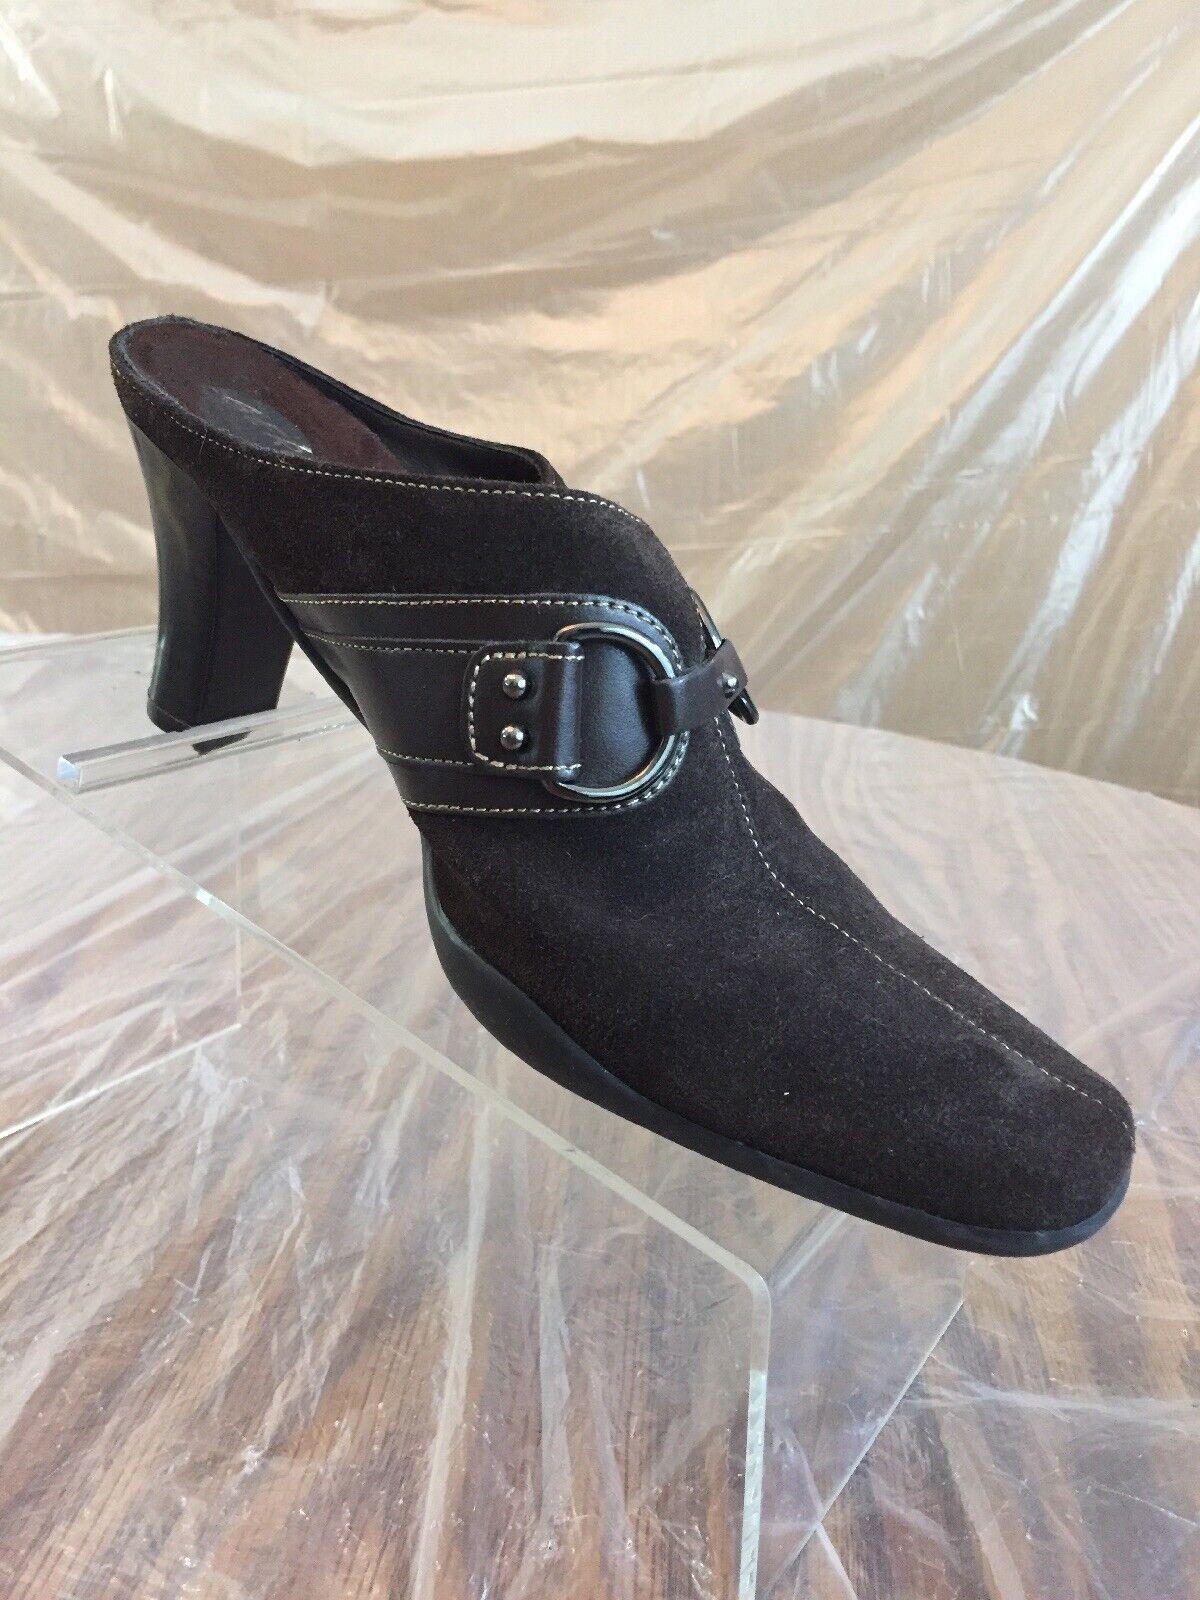 "Women's Aerosoles In a Cinch Brown Suede Mule 3"" Heels Clogs Ring Decor SZ 7.5M"